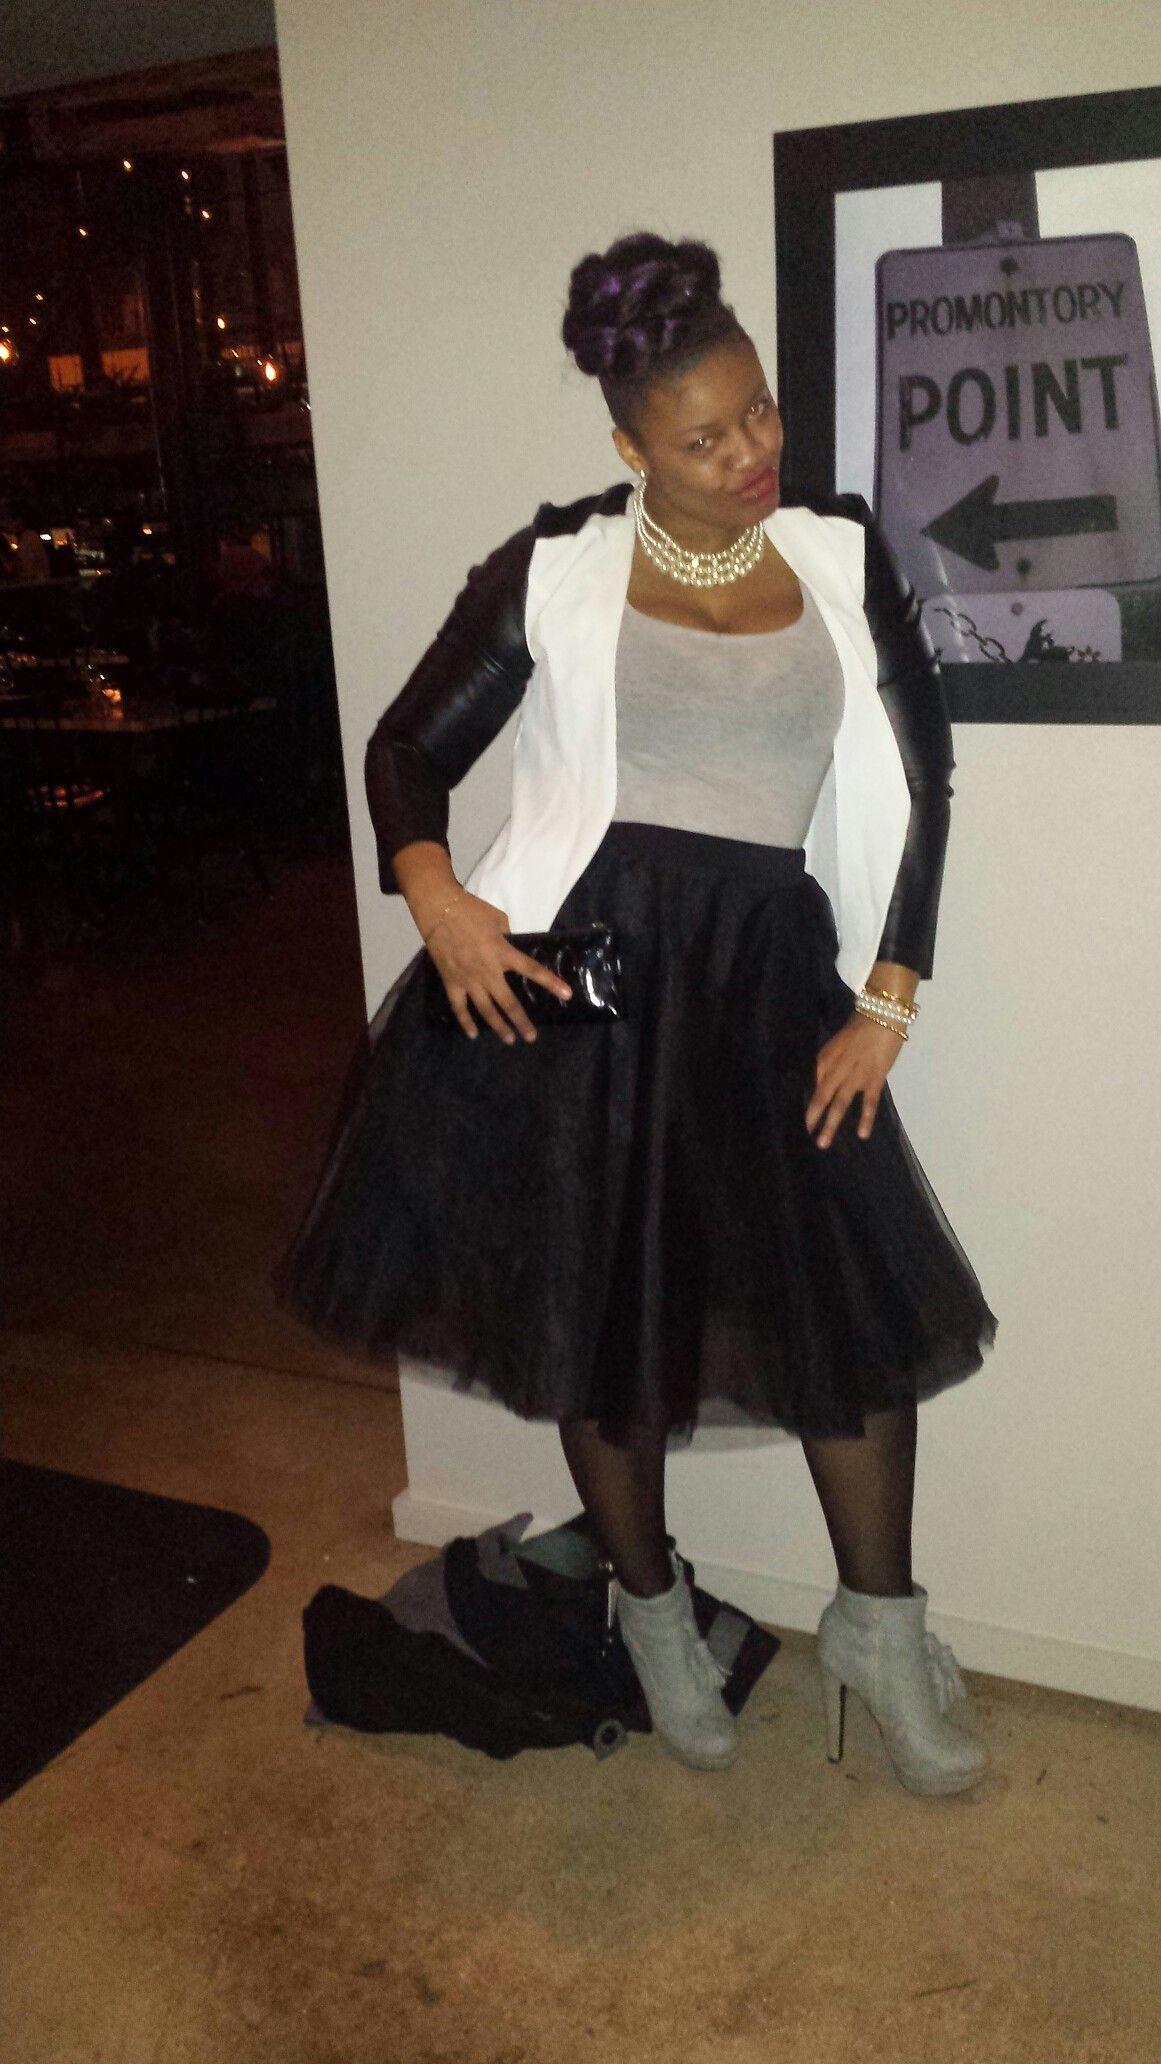 Tulle skirt on point